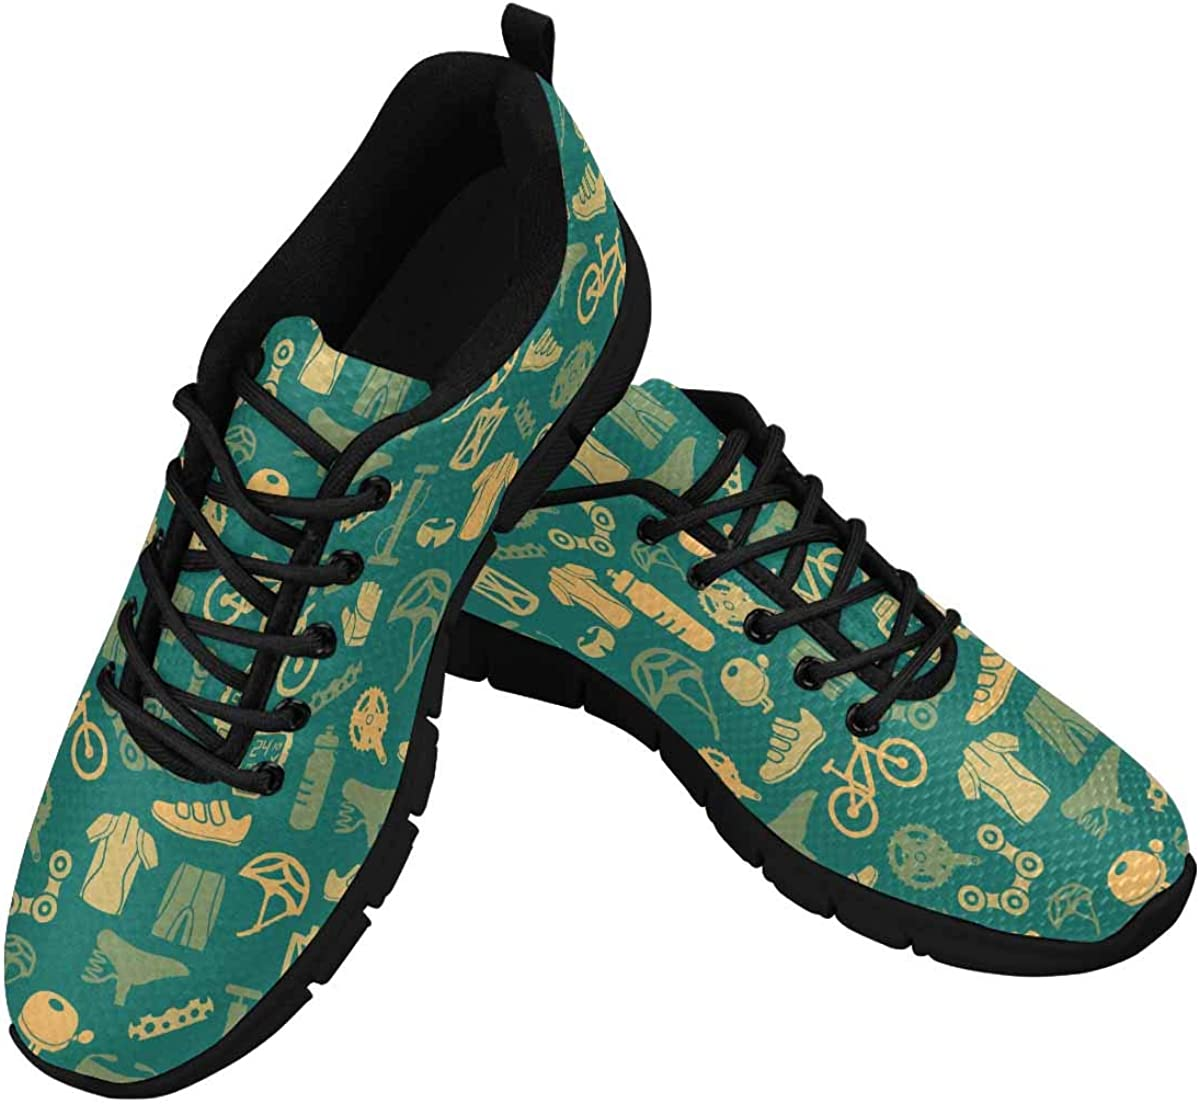 INTERESTPRINT Vintage Bicycle Pattern Women's Tennis Running Shoes Lightweight Sneakers